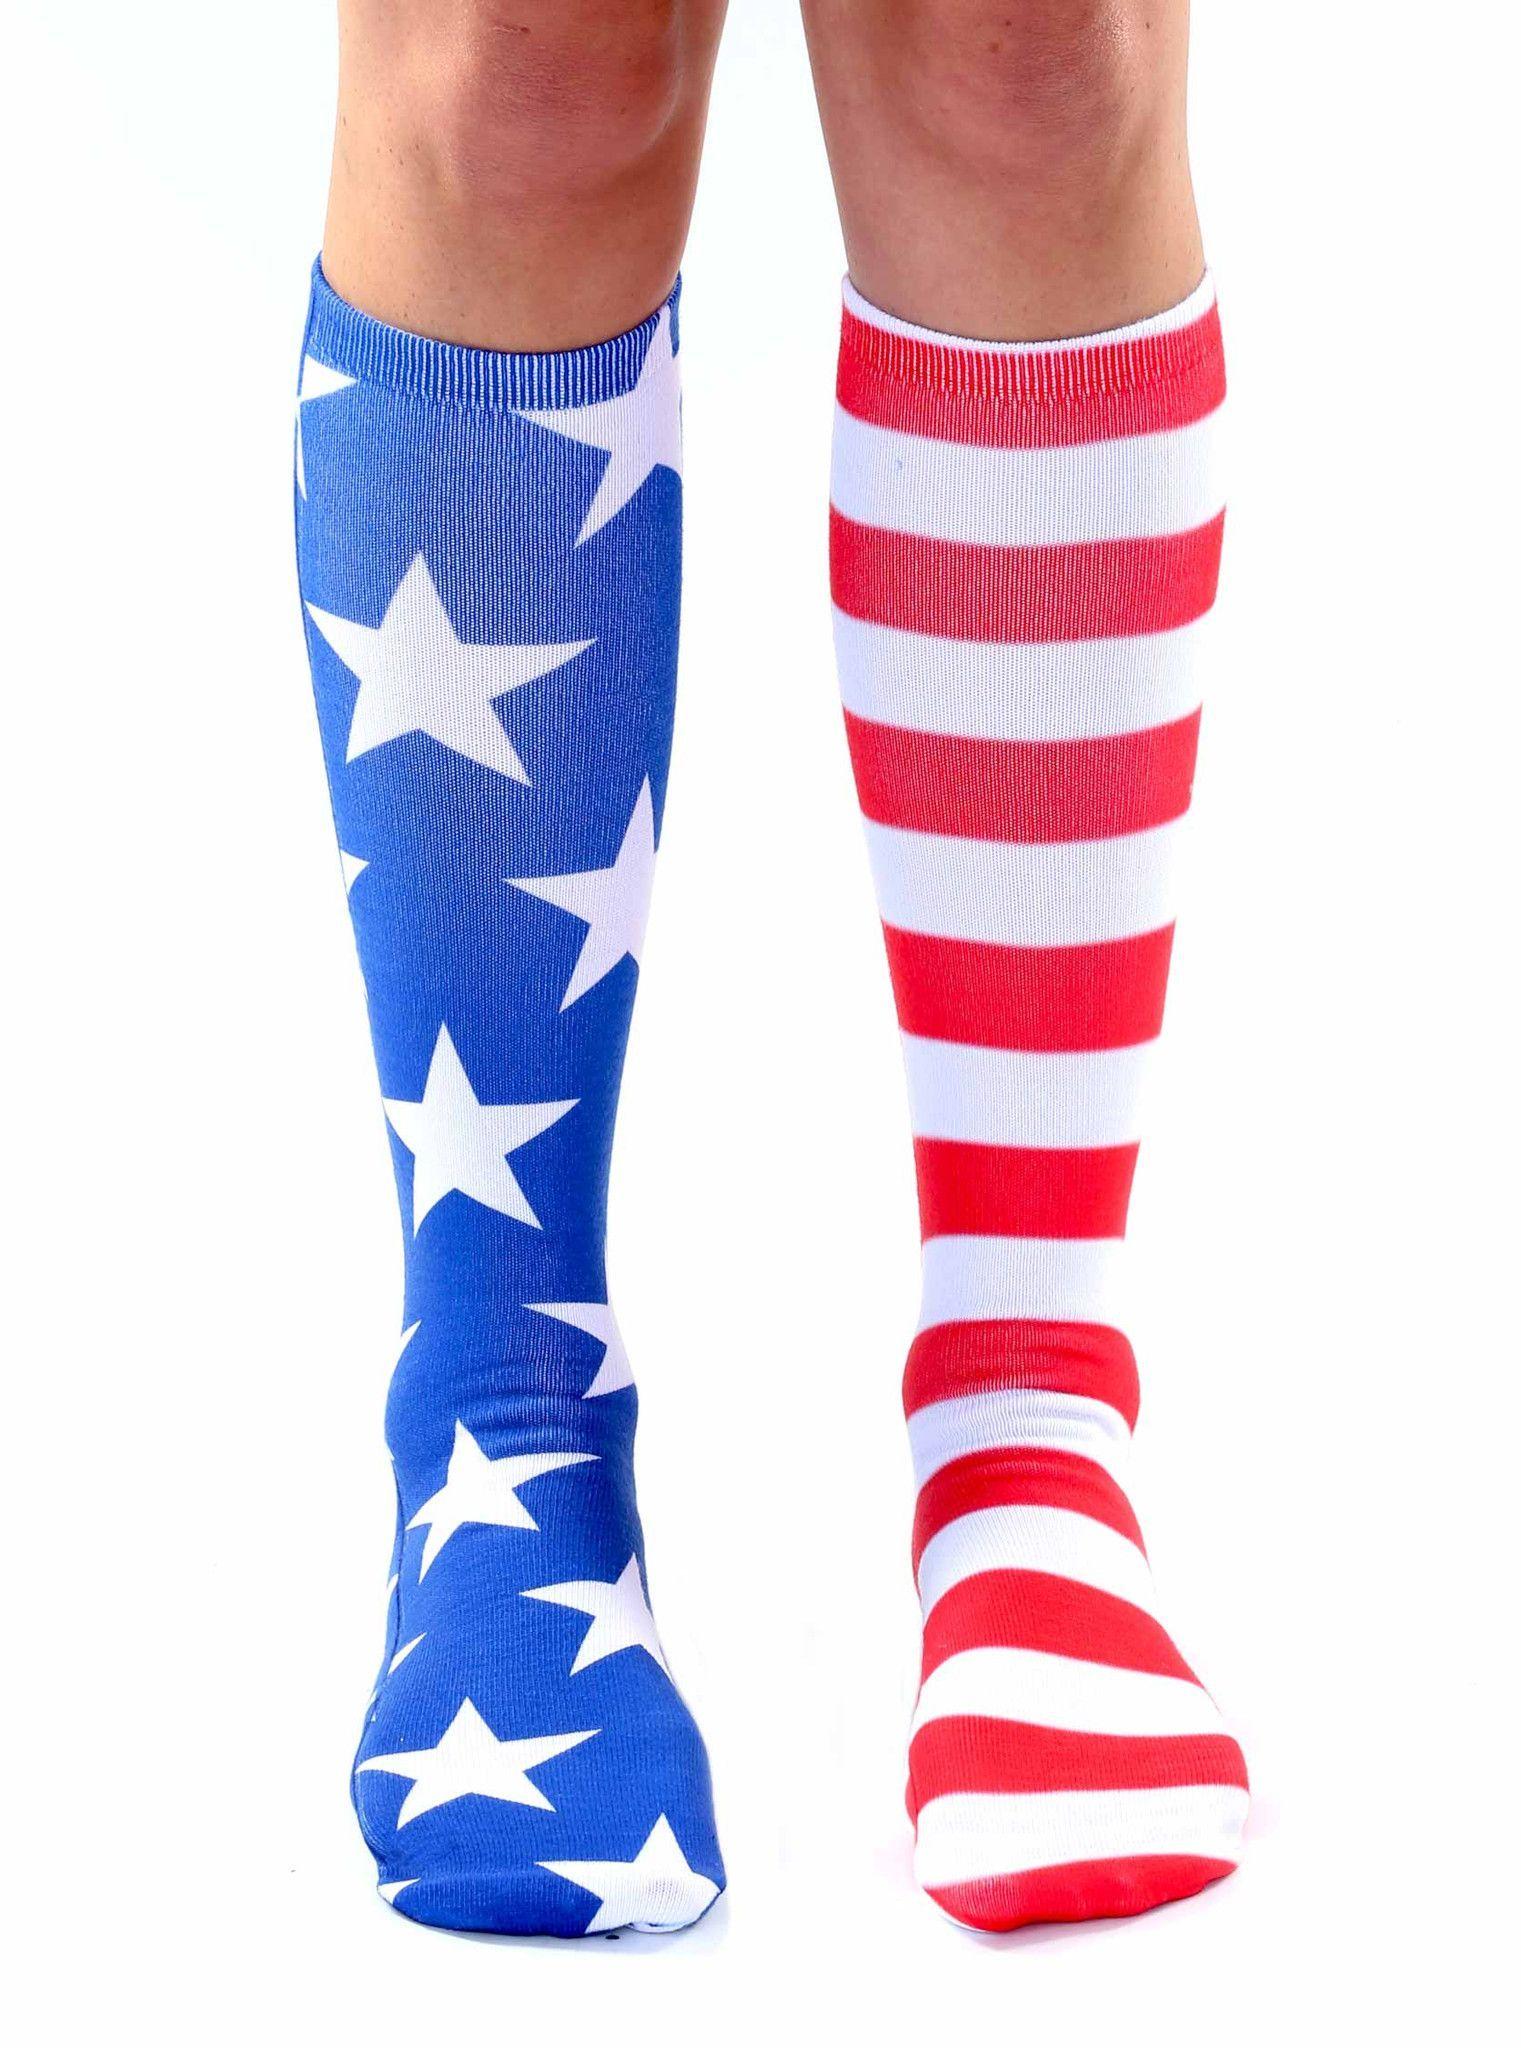 33a14cc389a Stars and Stripes Knee High Socks